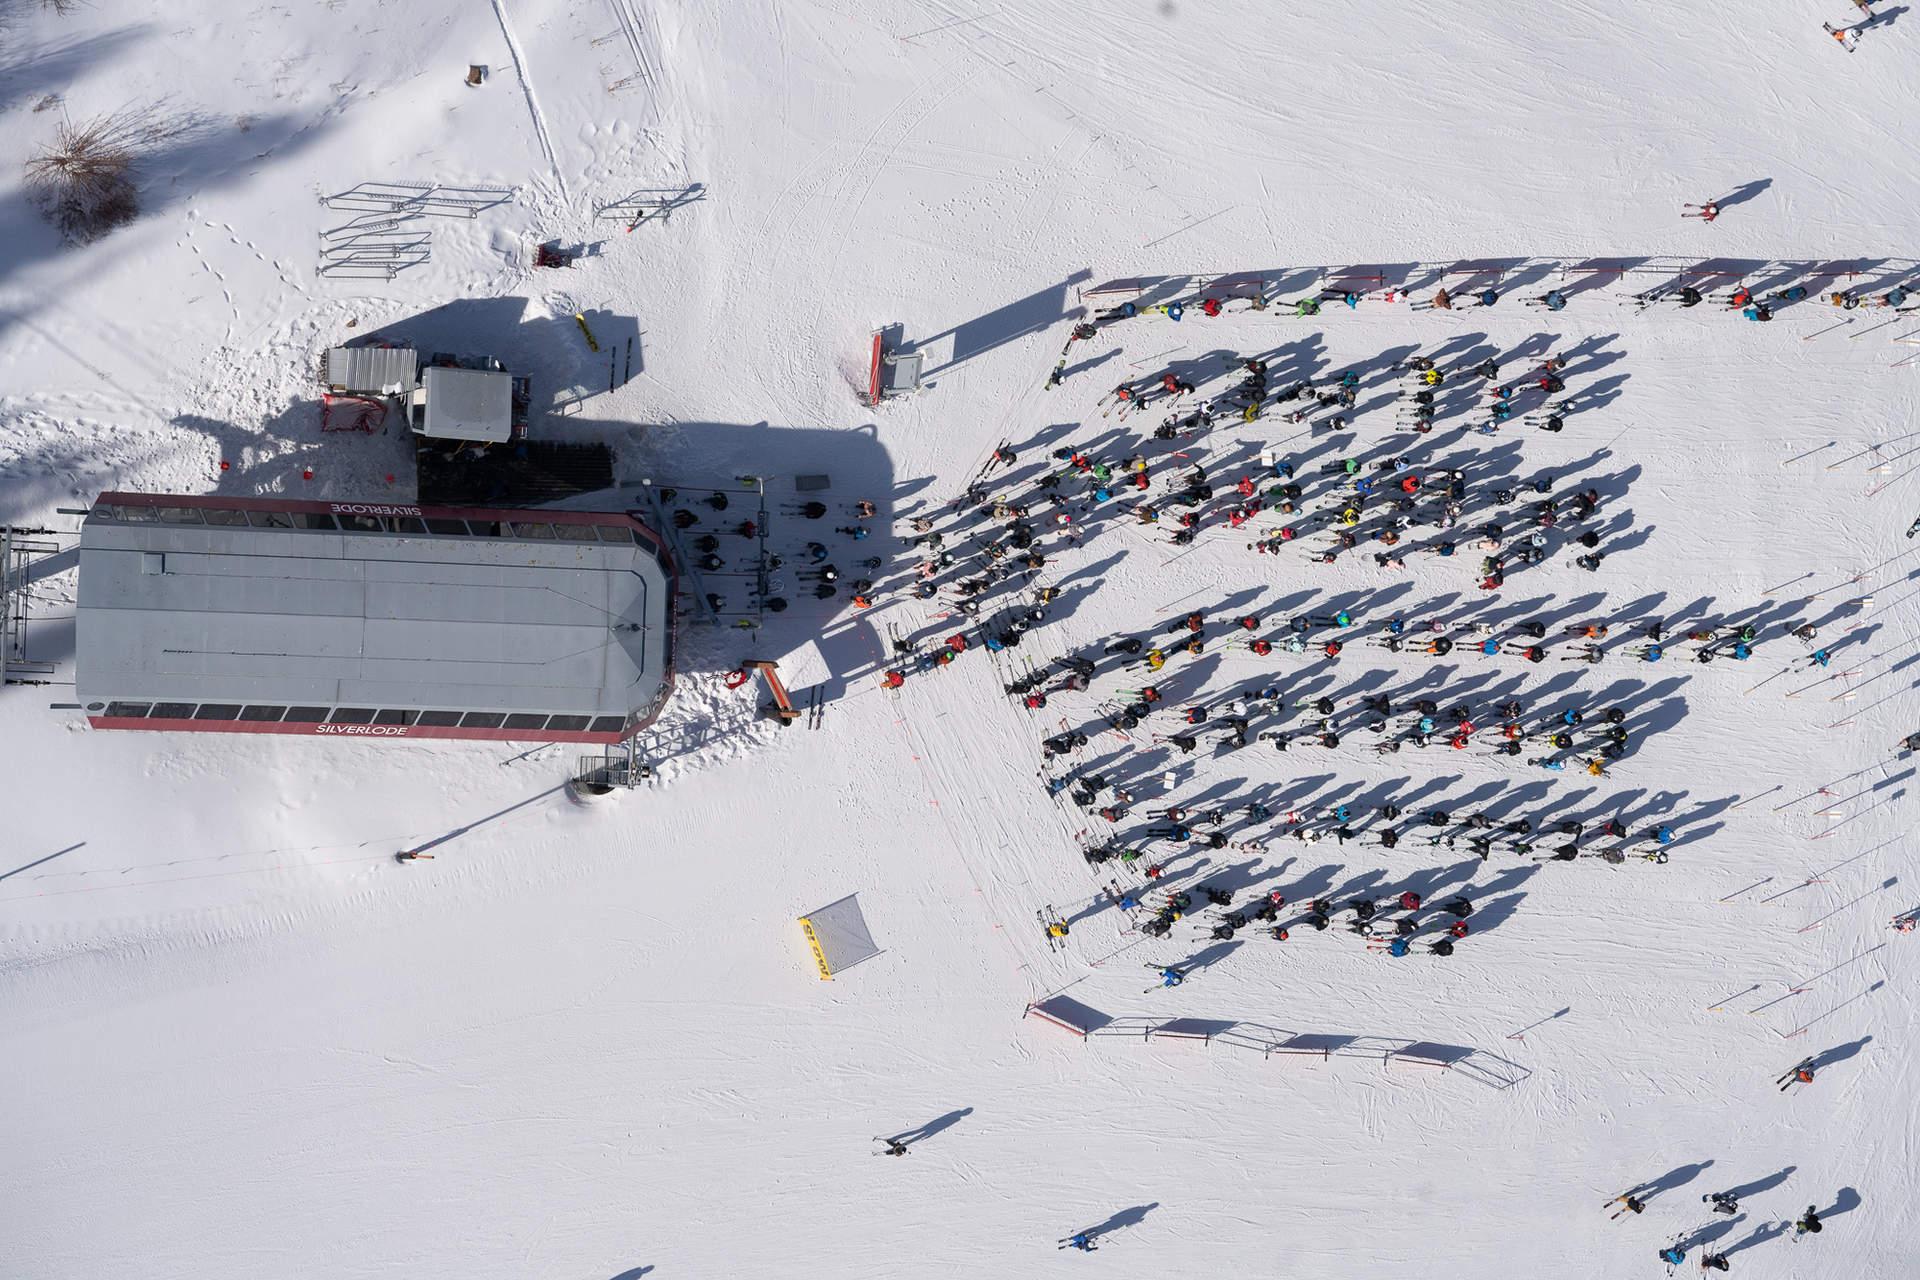 'Lineup', Park City Ski Resort